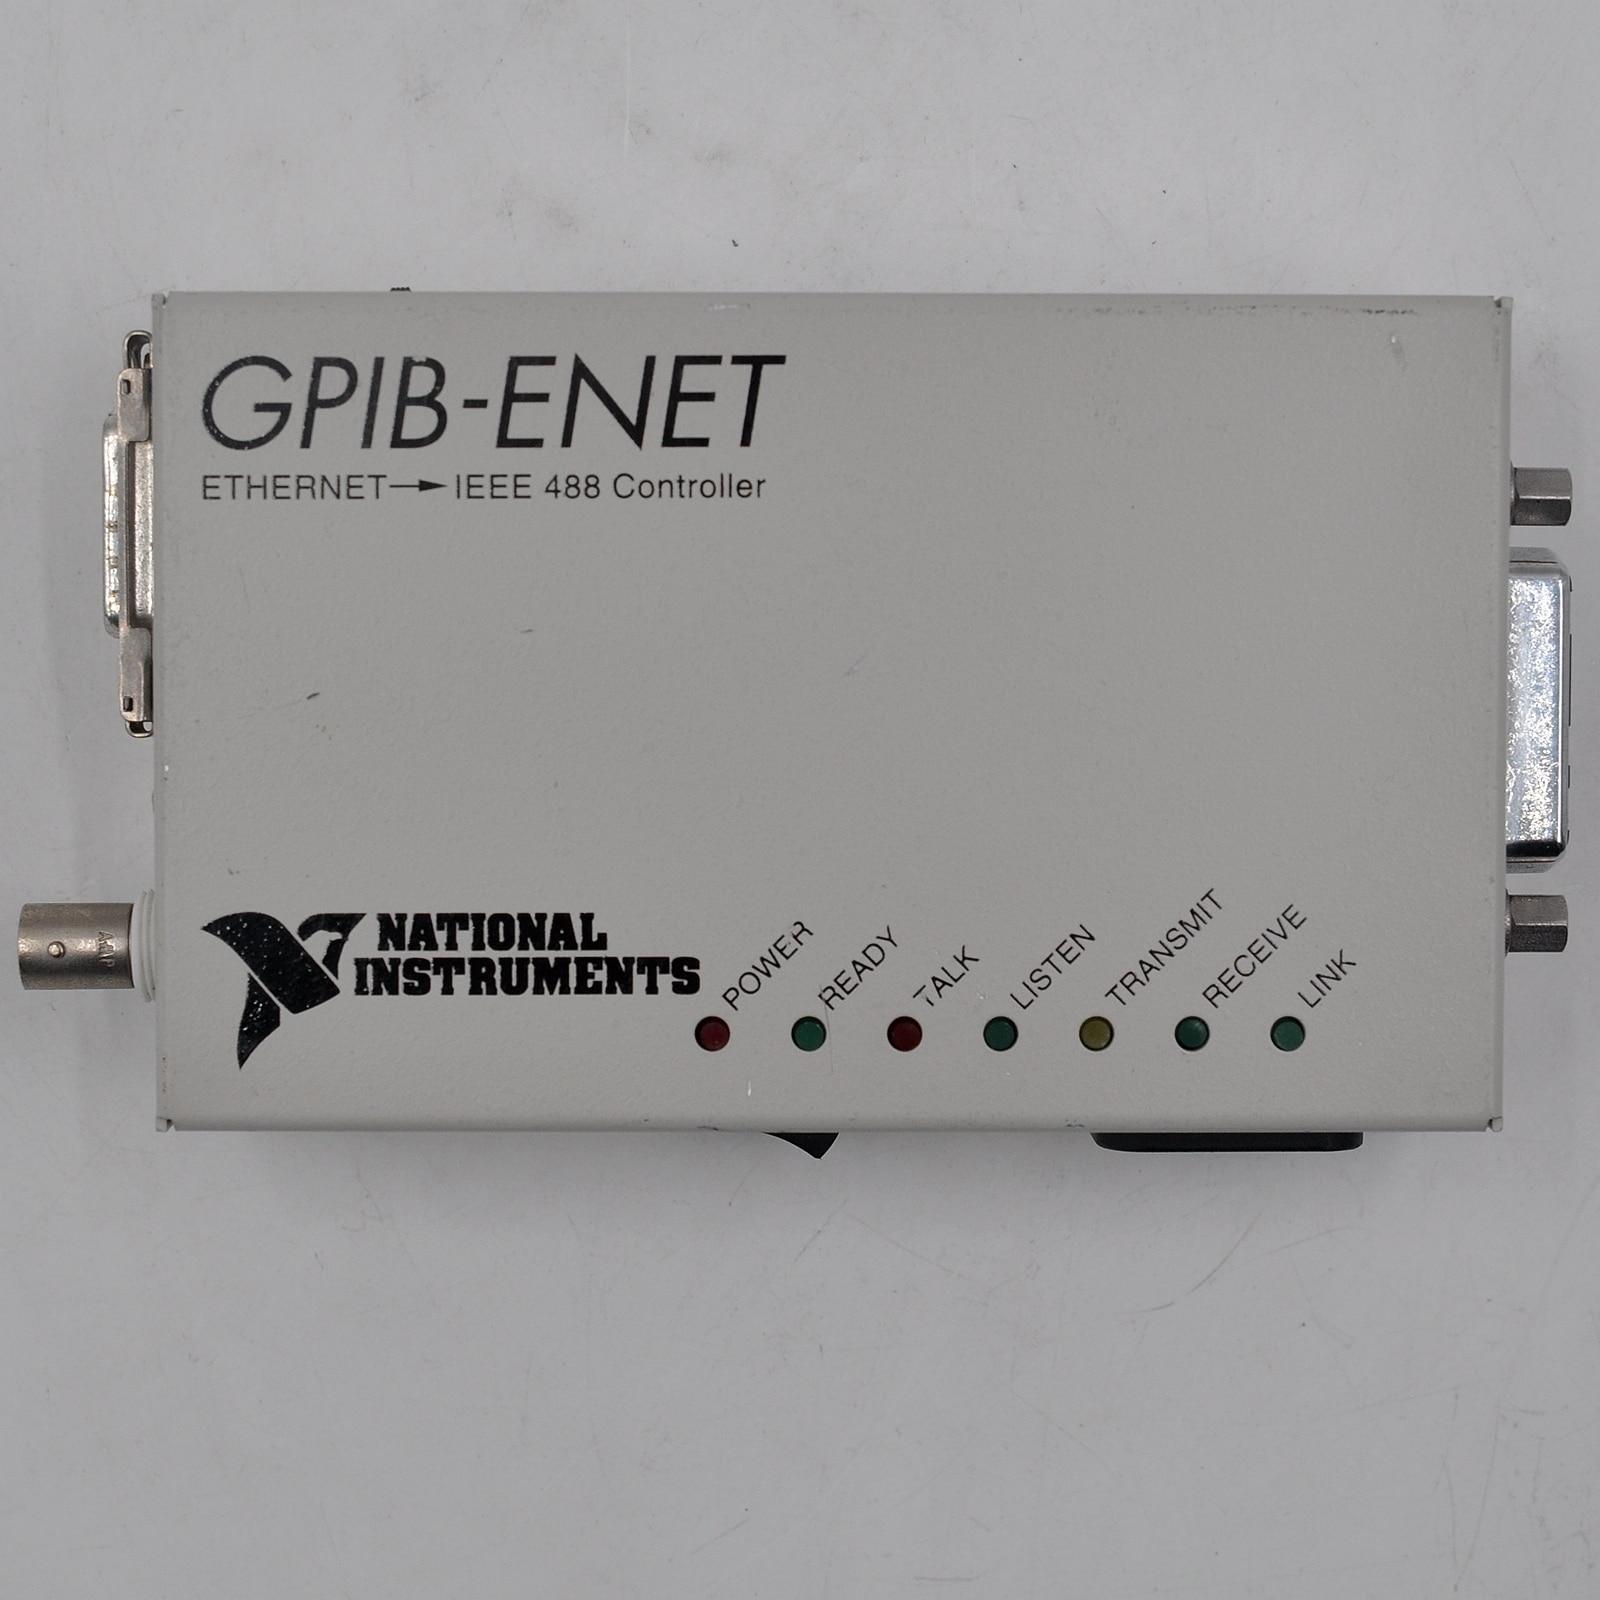 USA GPIB-ENET 115V 50-60Hz 110mA